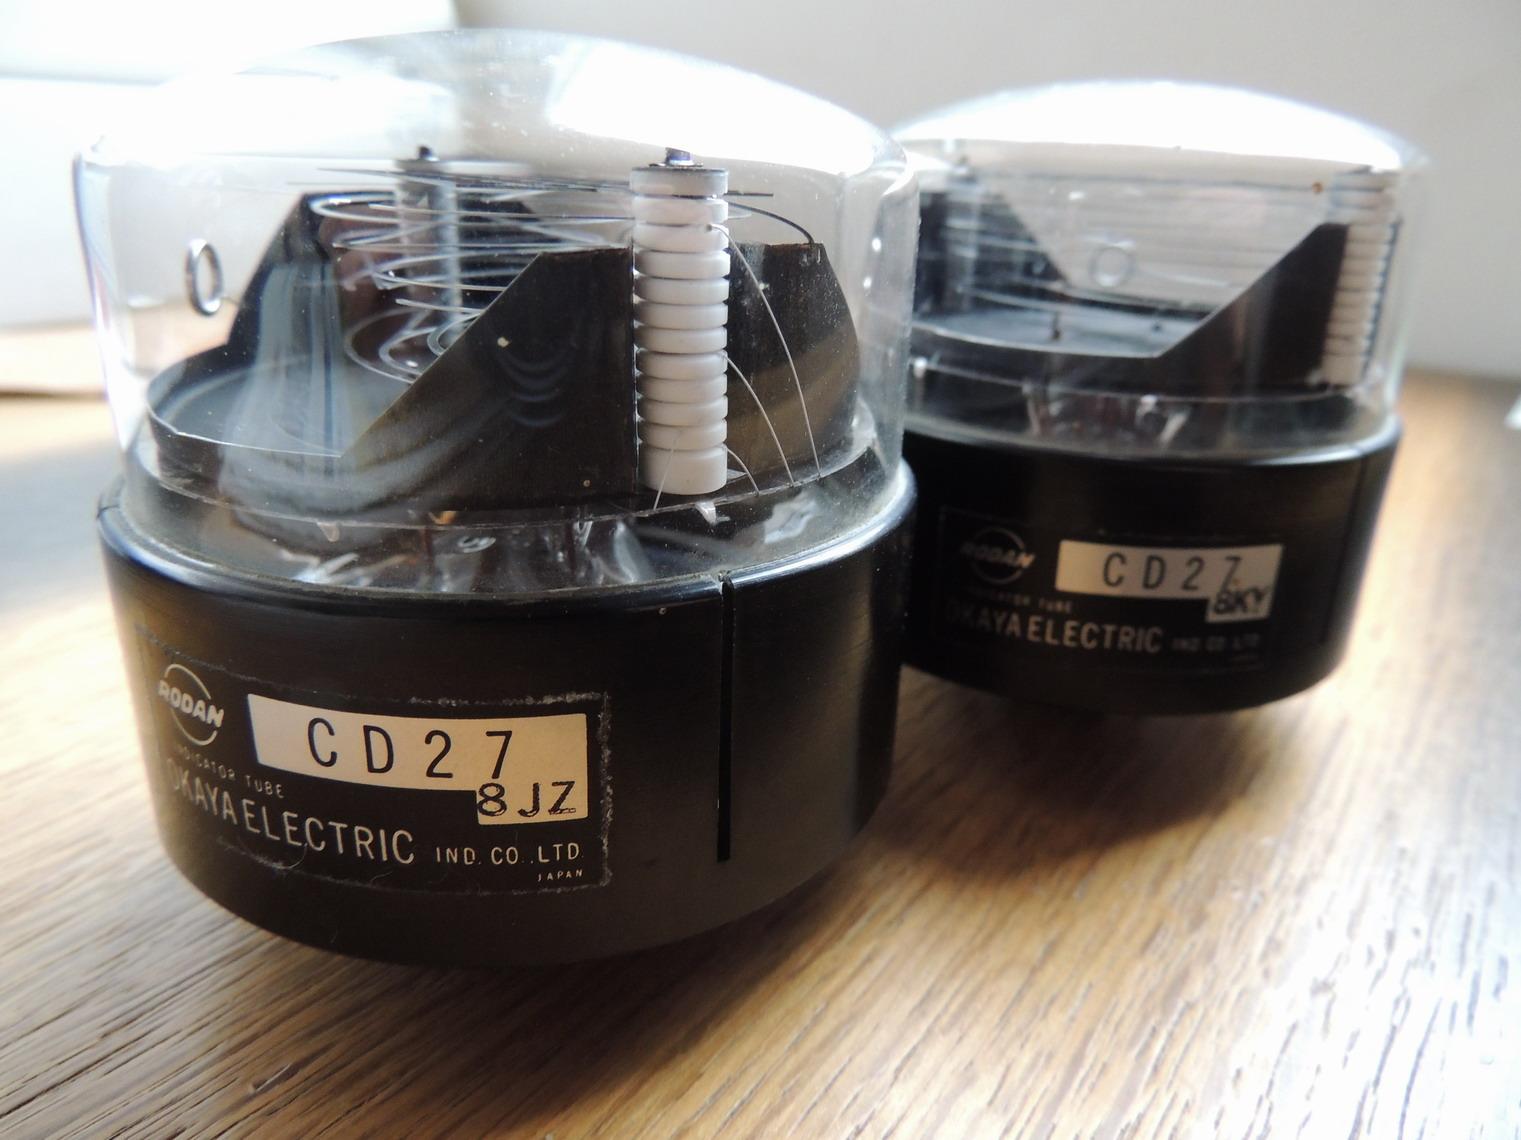 Rodan Nixie tube CD27